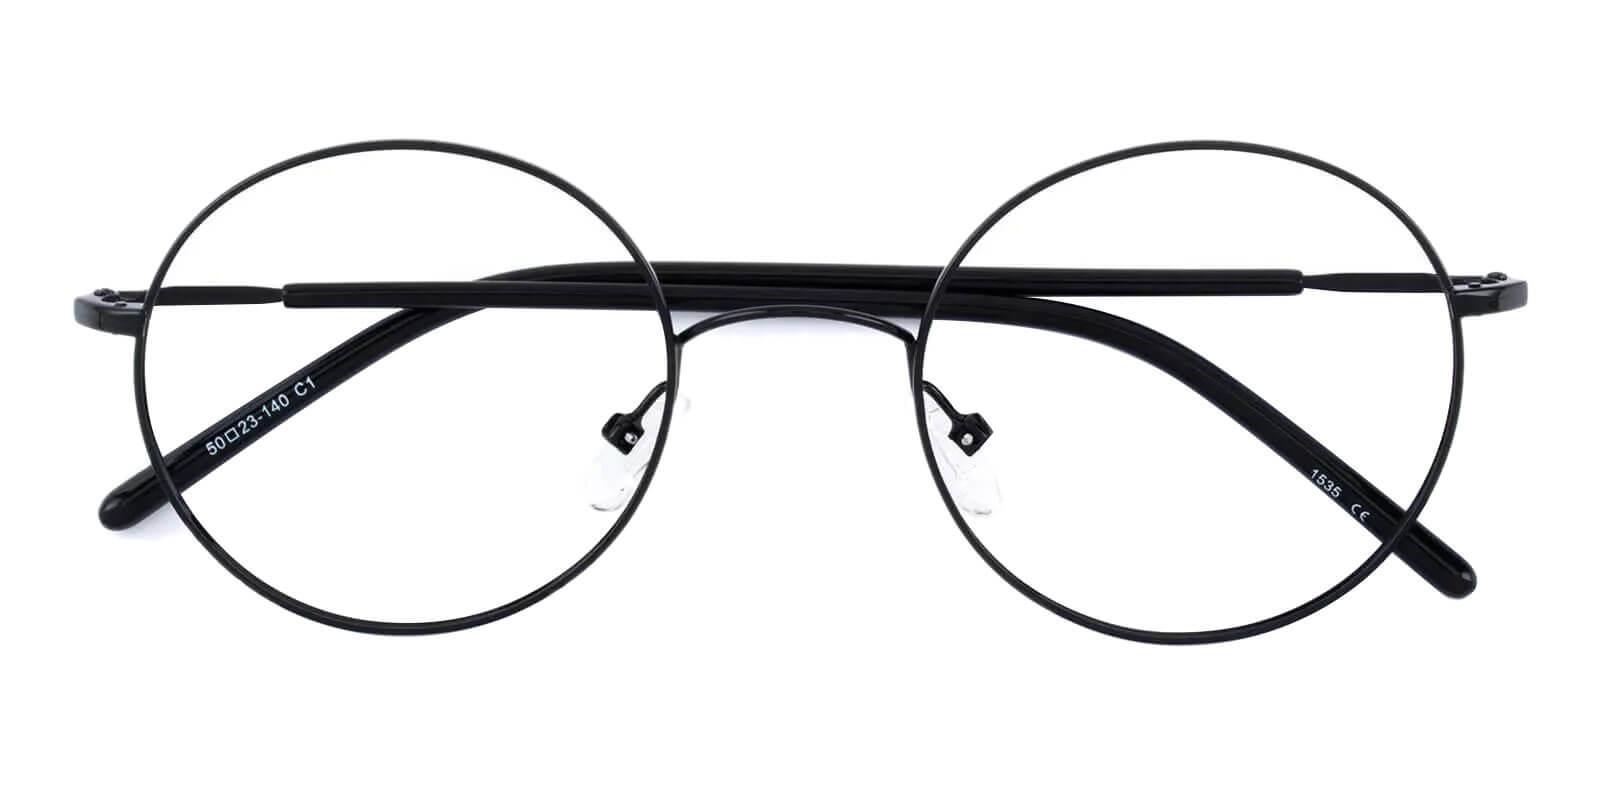 Zoey Black Metal Eyeglasses , Lightweight , NosePads Frames from ABBE Glasses